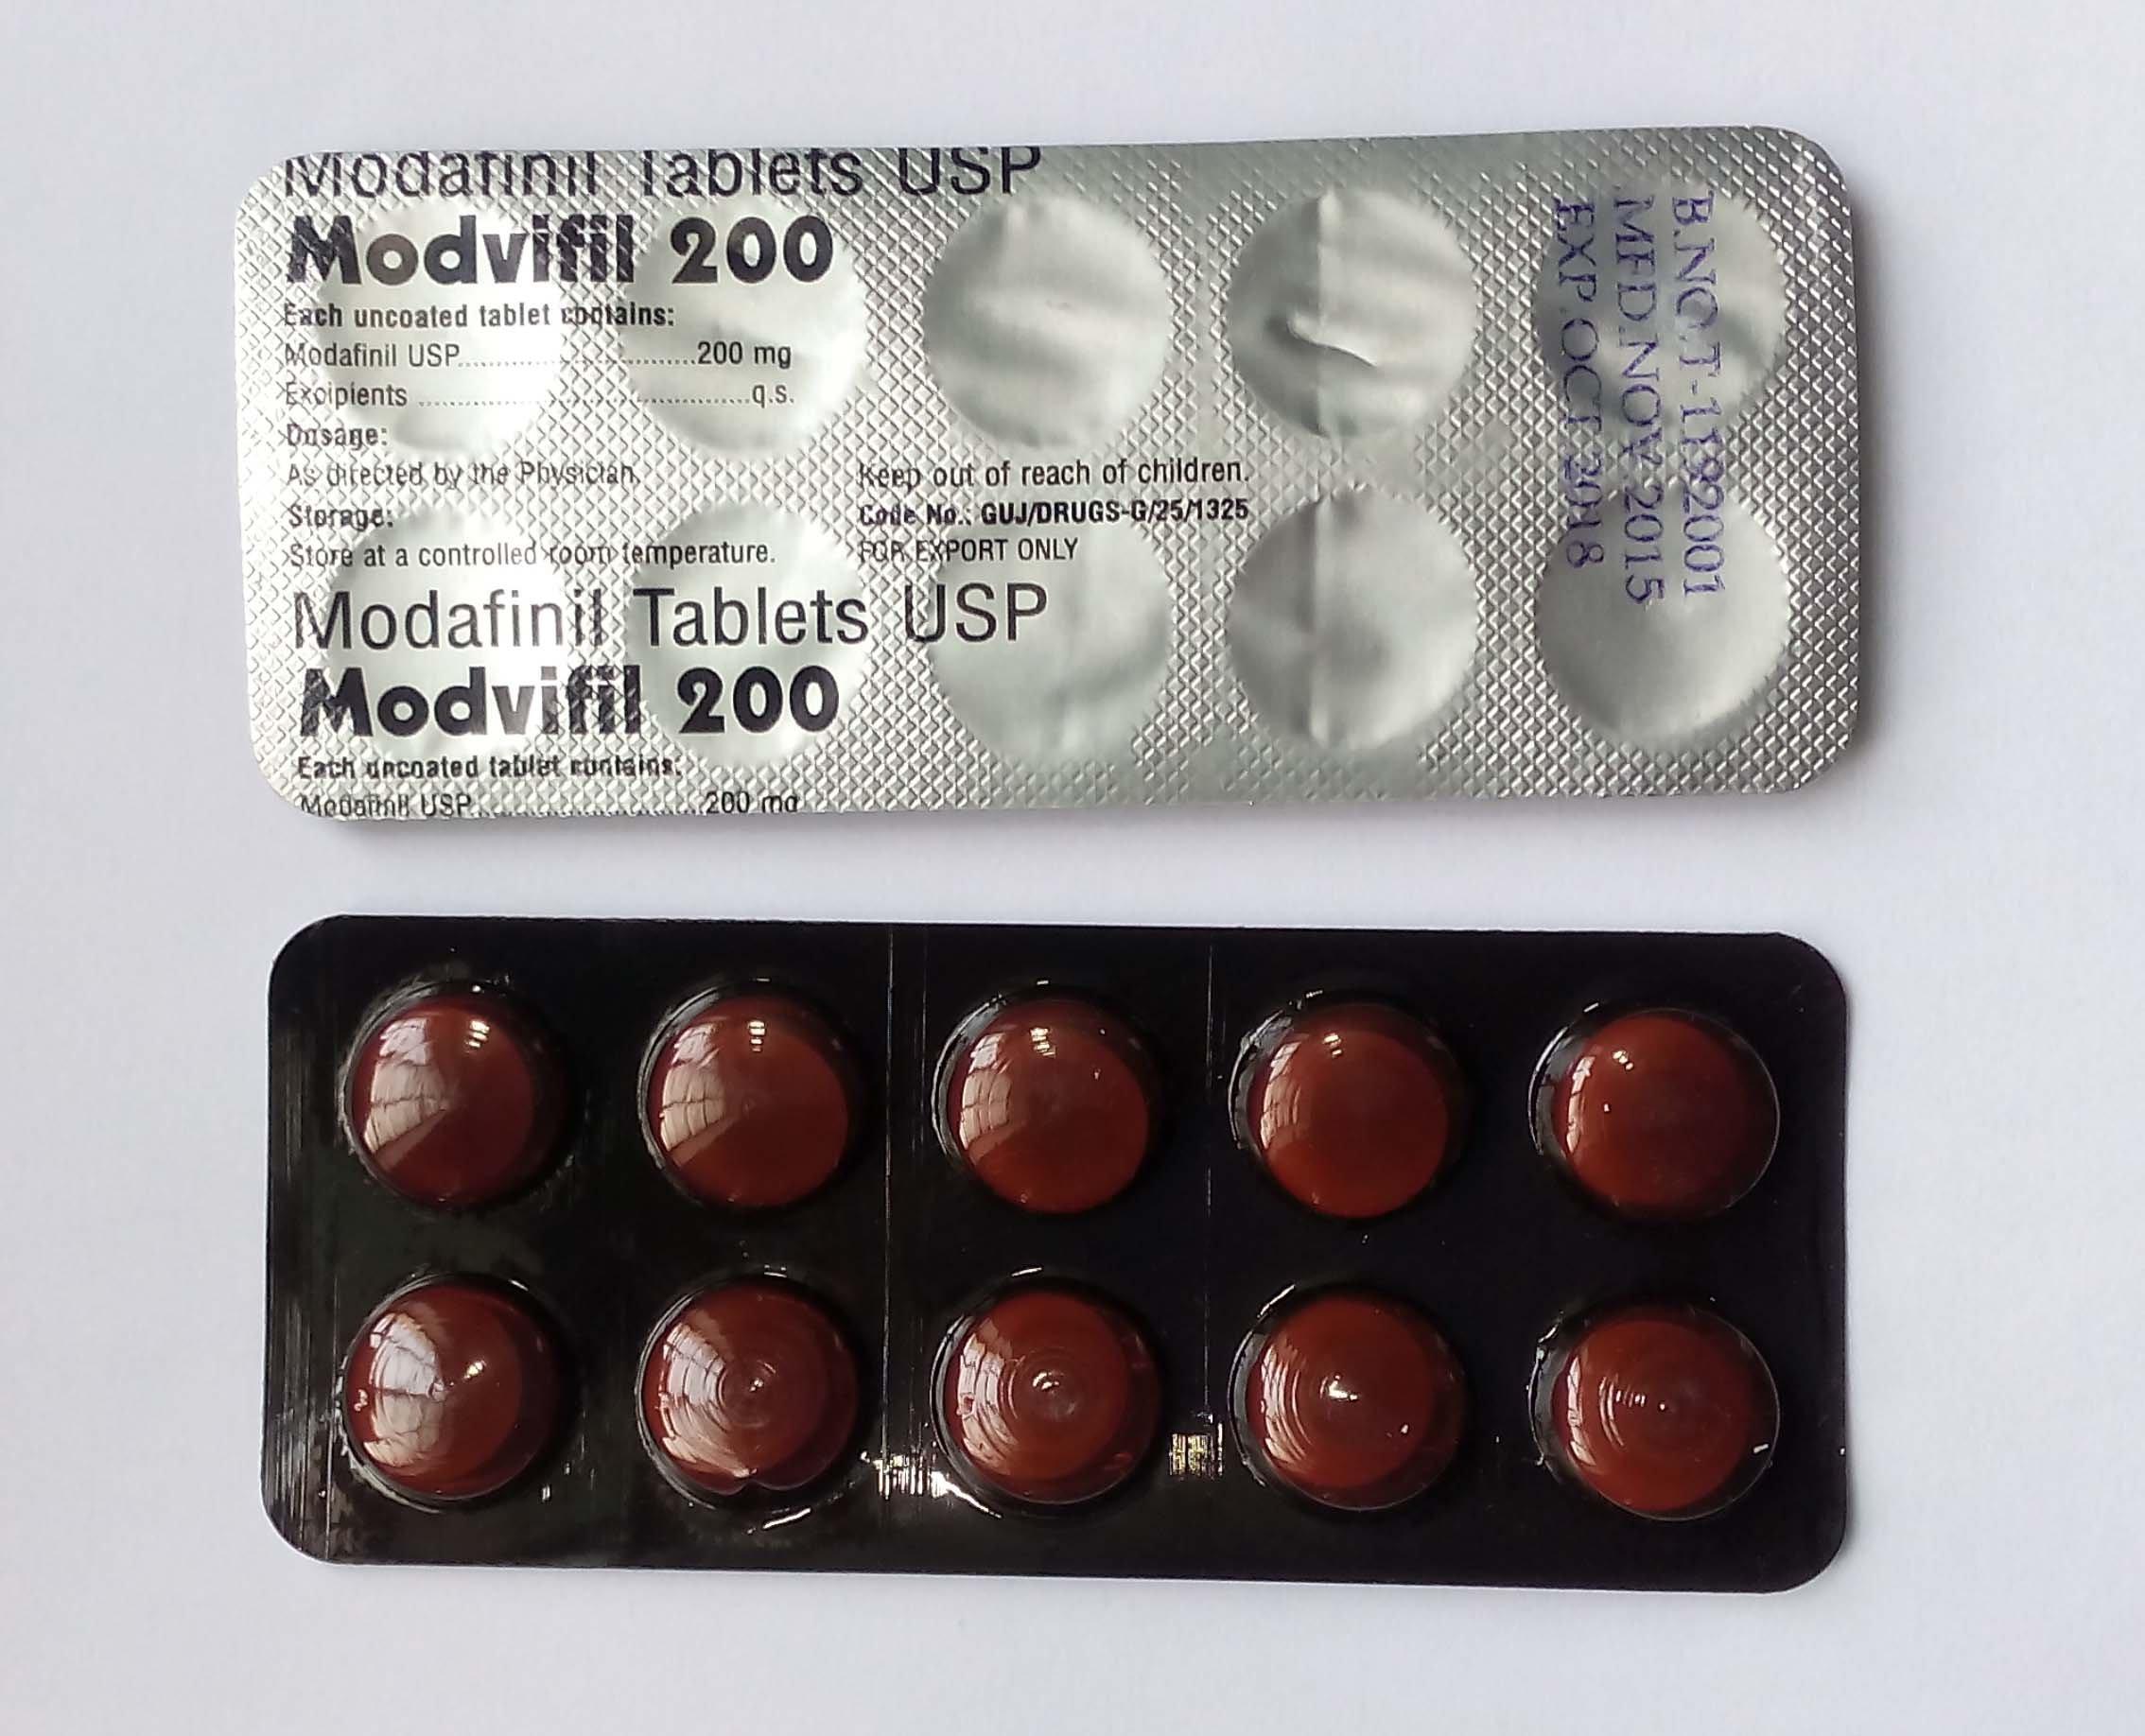 Buy Modvifil 200mg Online Modafinil 200mg Modvifil Maunfacturers